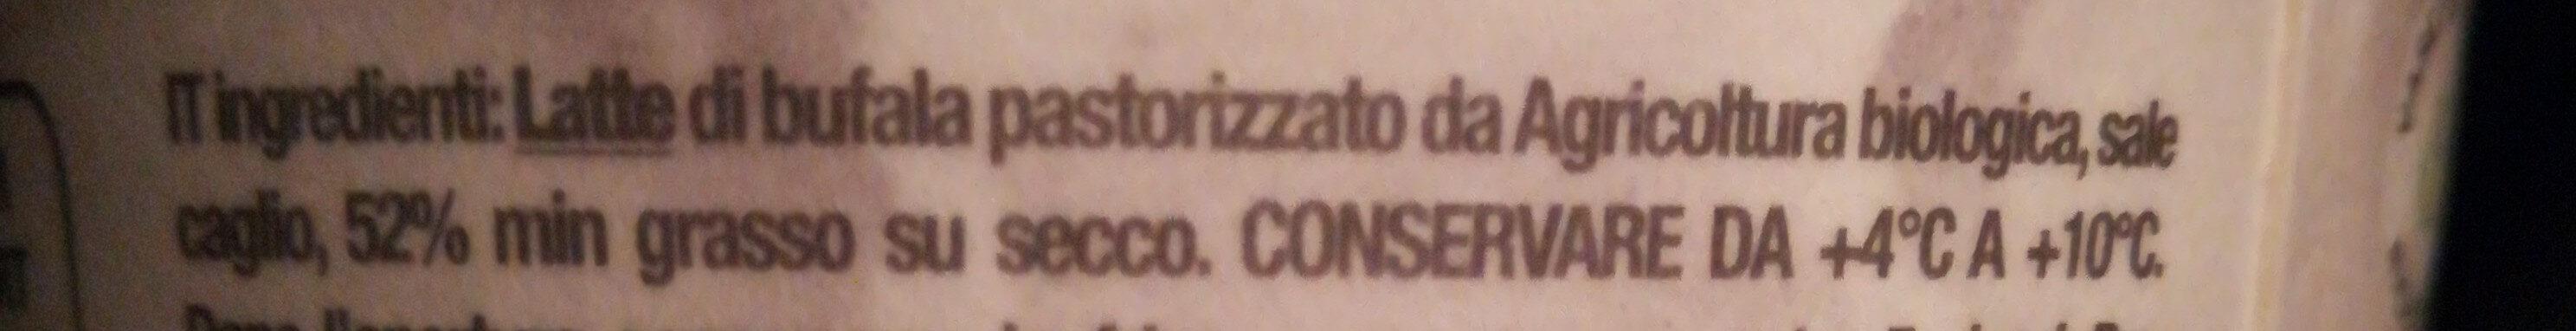 Mozzarella di bufala campana d. O. P - Ingredienti - it